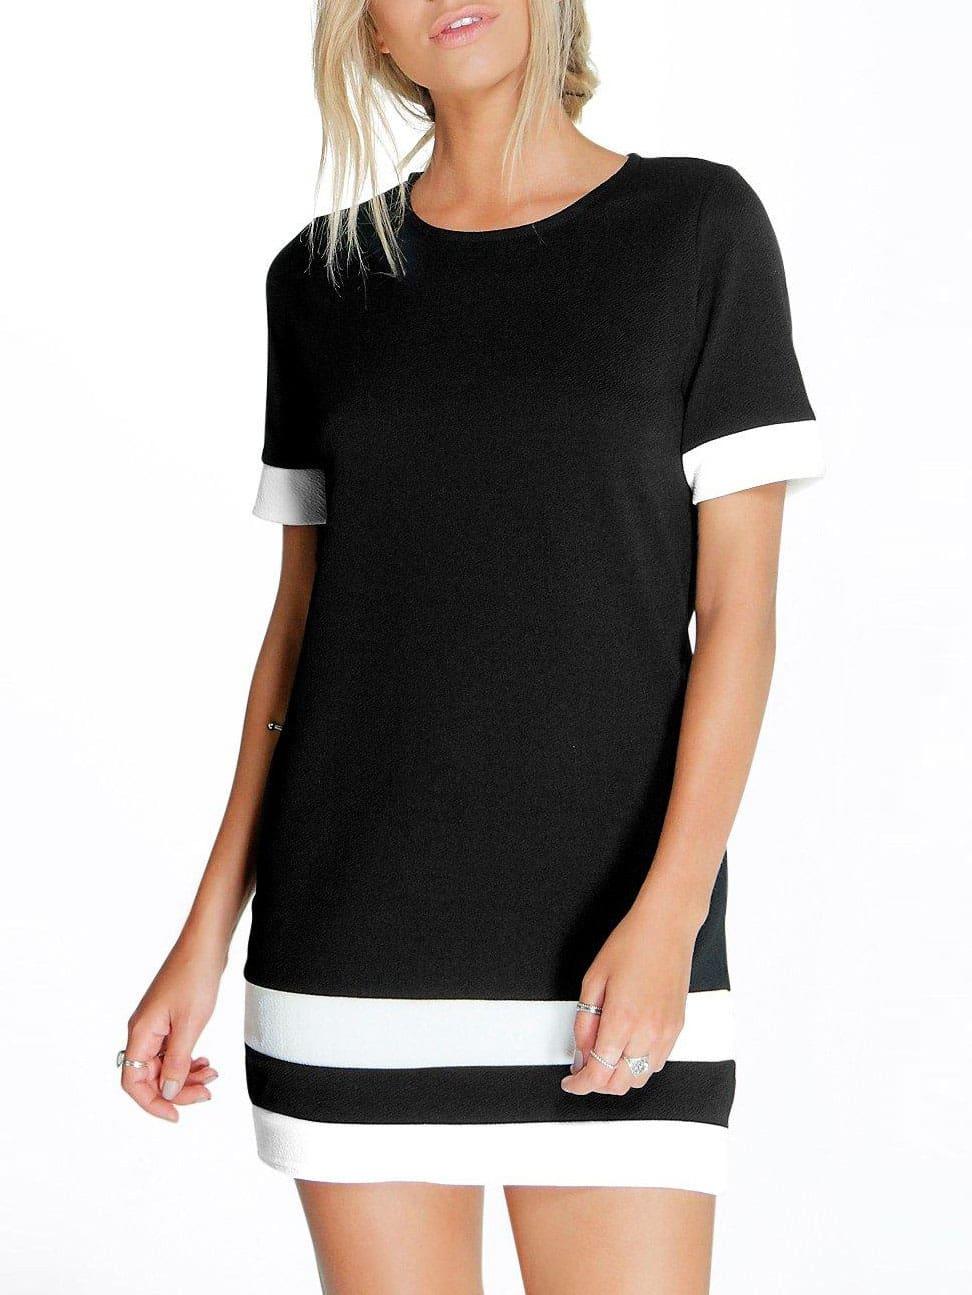 56b2084e82 Black White Patchwork Short Sleeve Shift Dress EmmaCloth-Women Fast ...